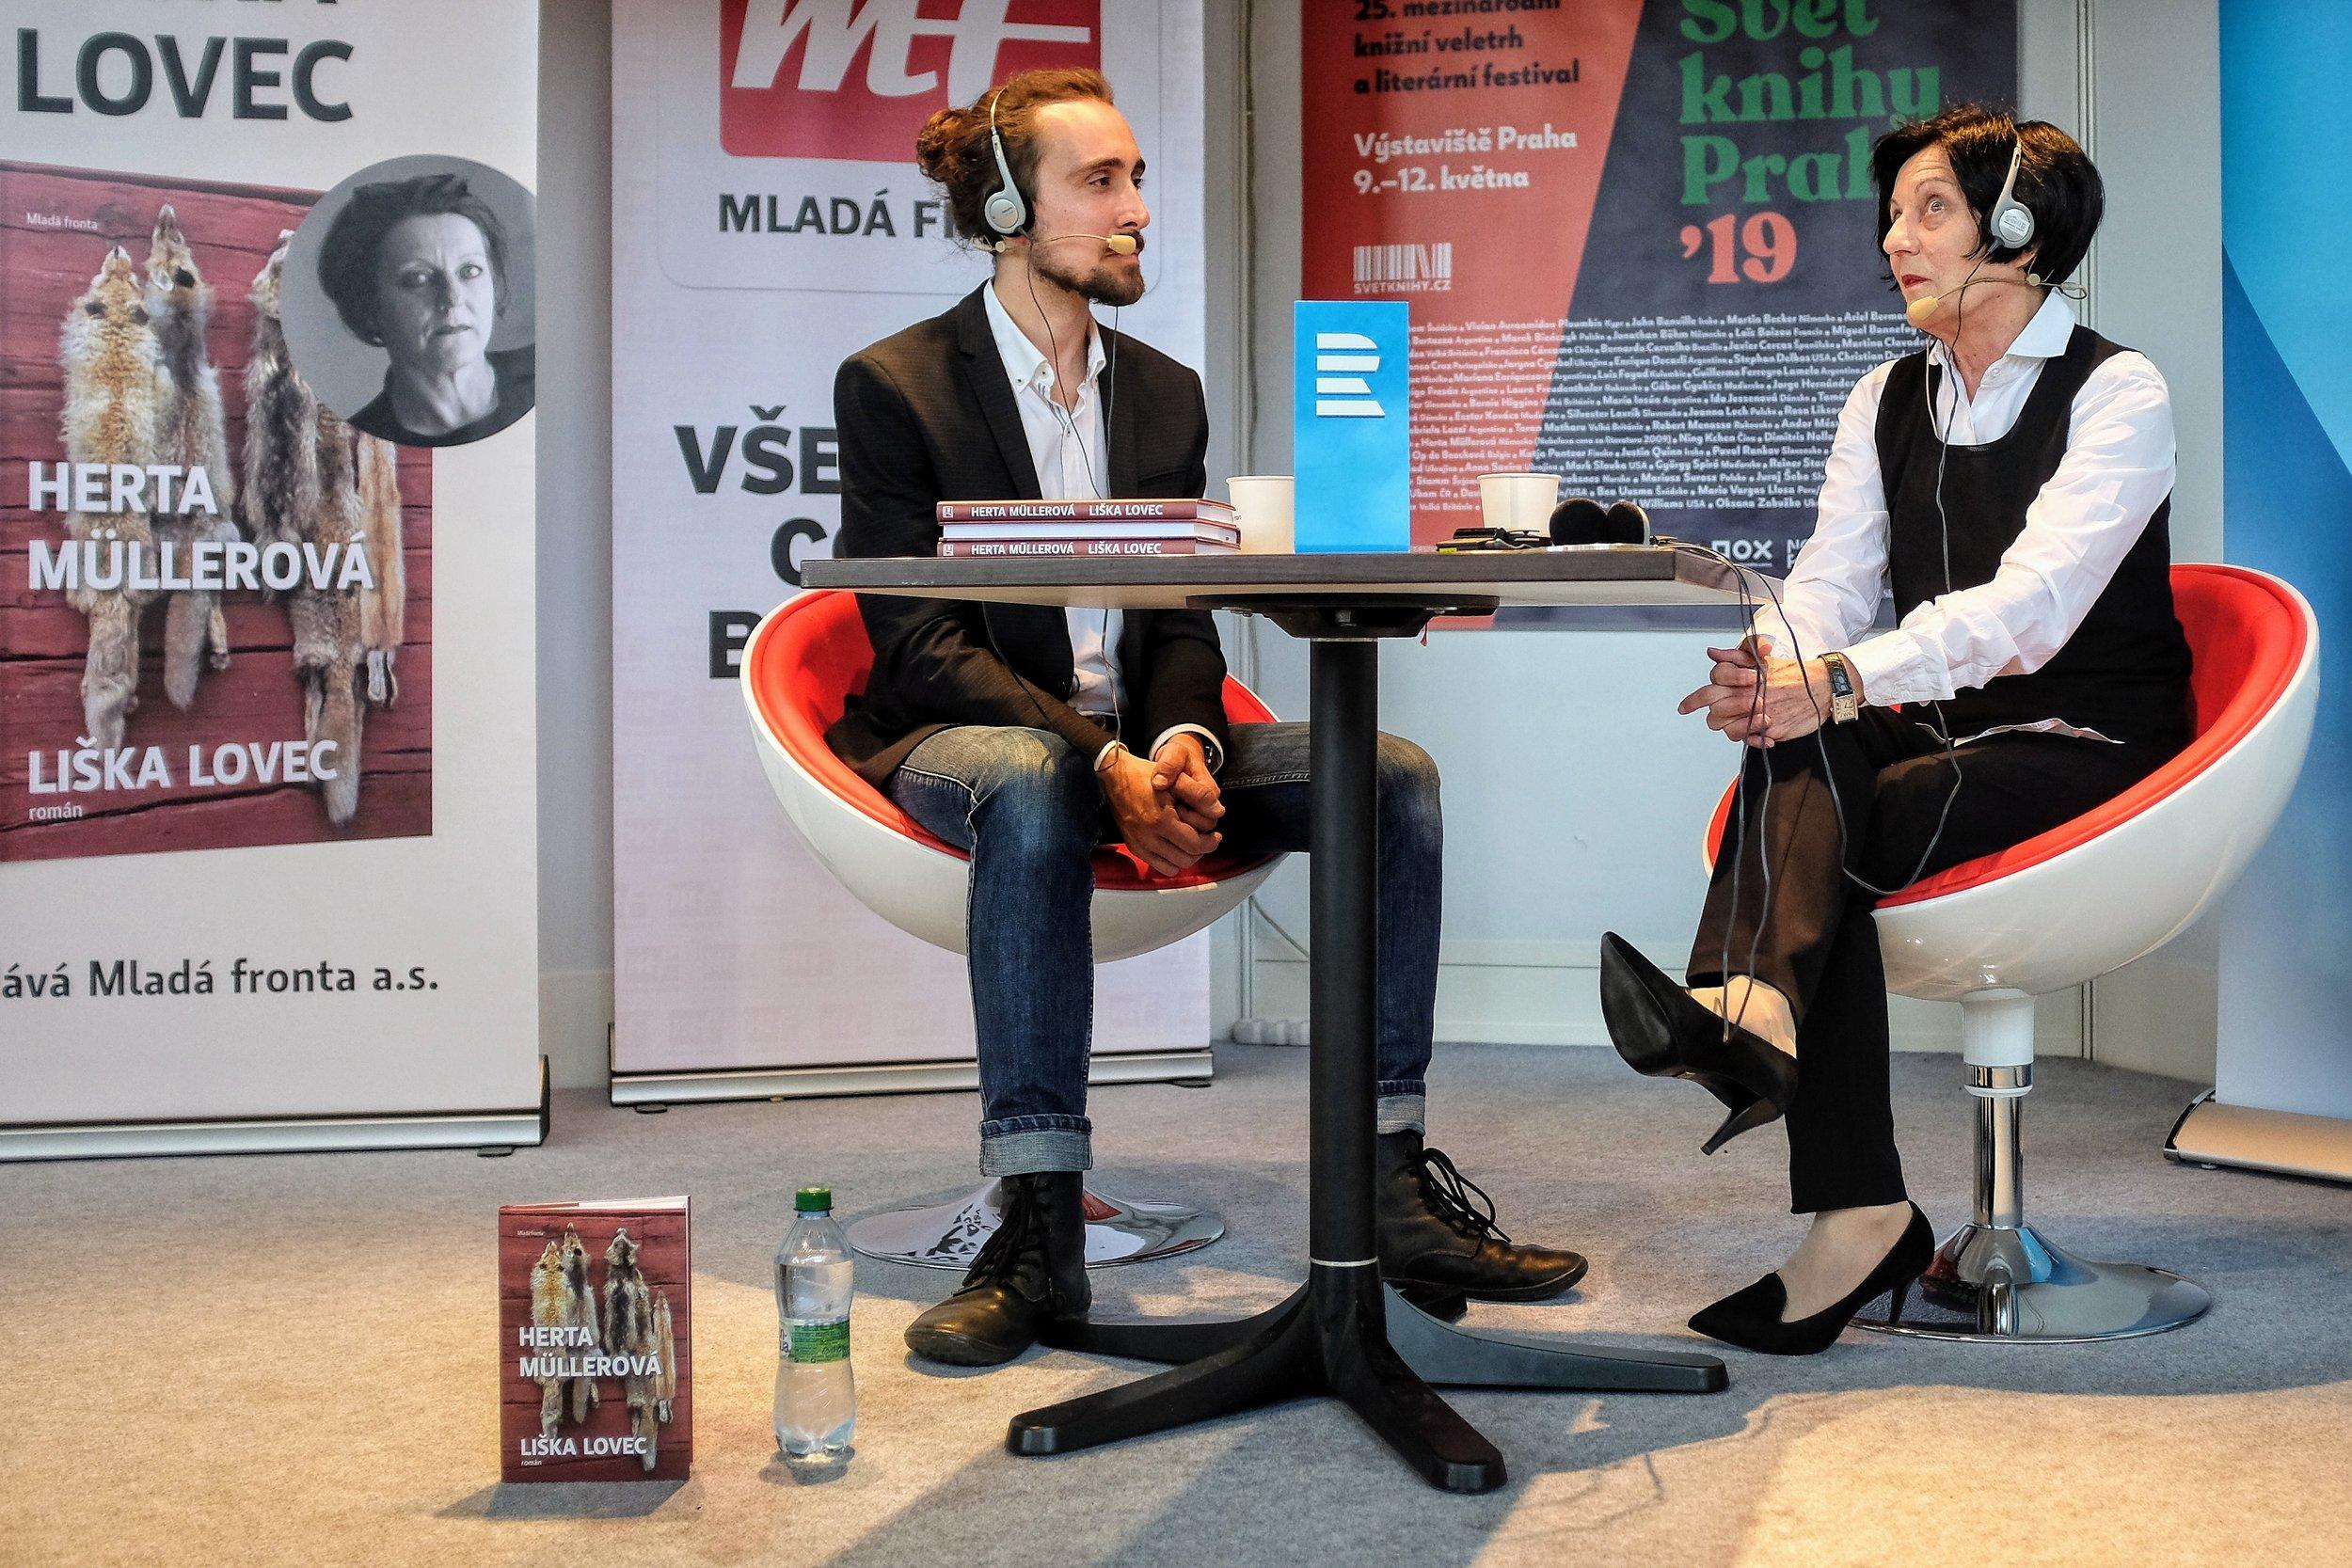 Herta Müller talk with Petr Gojda